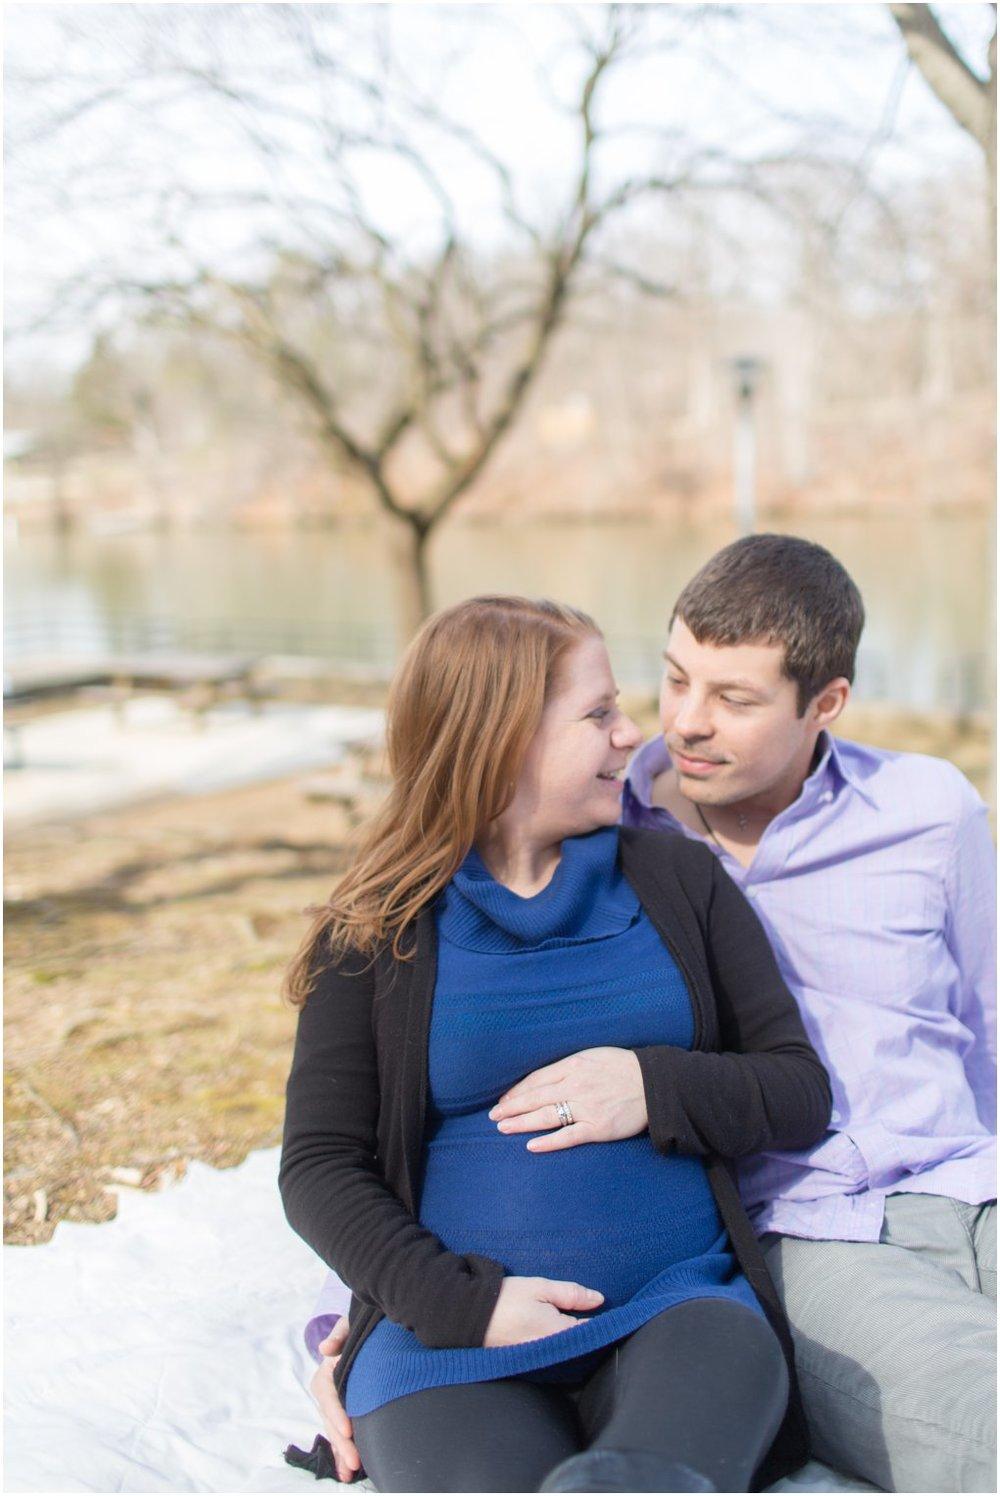 McCord-Maternity-2014-24.jpg